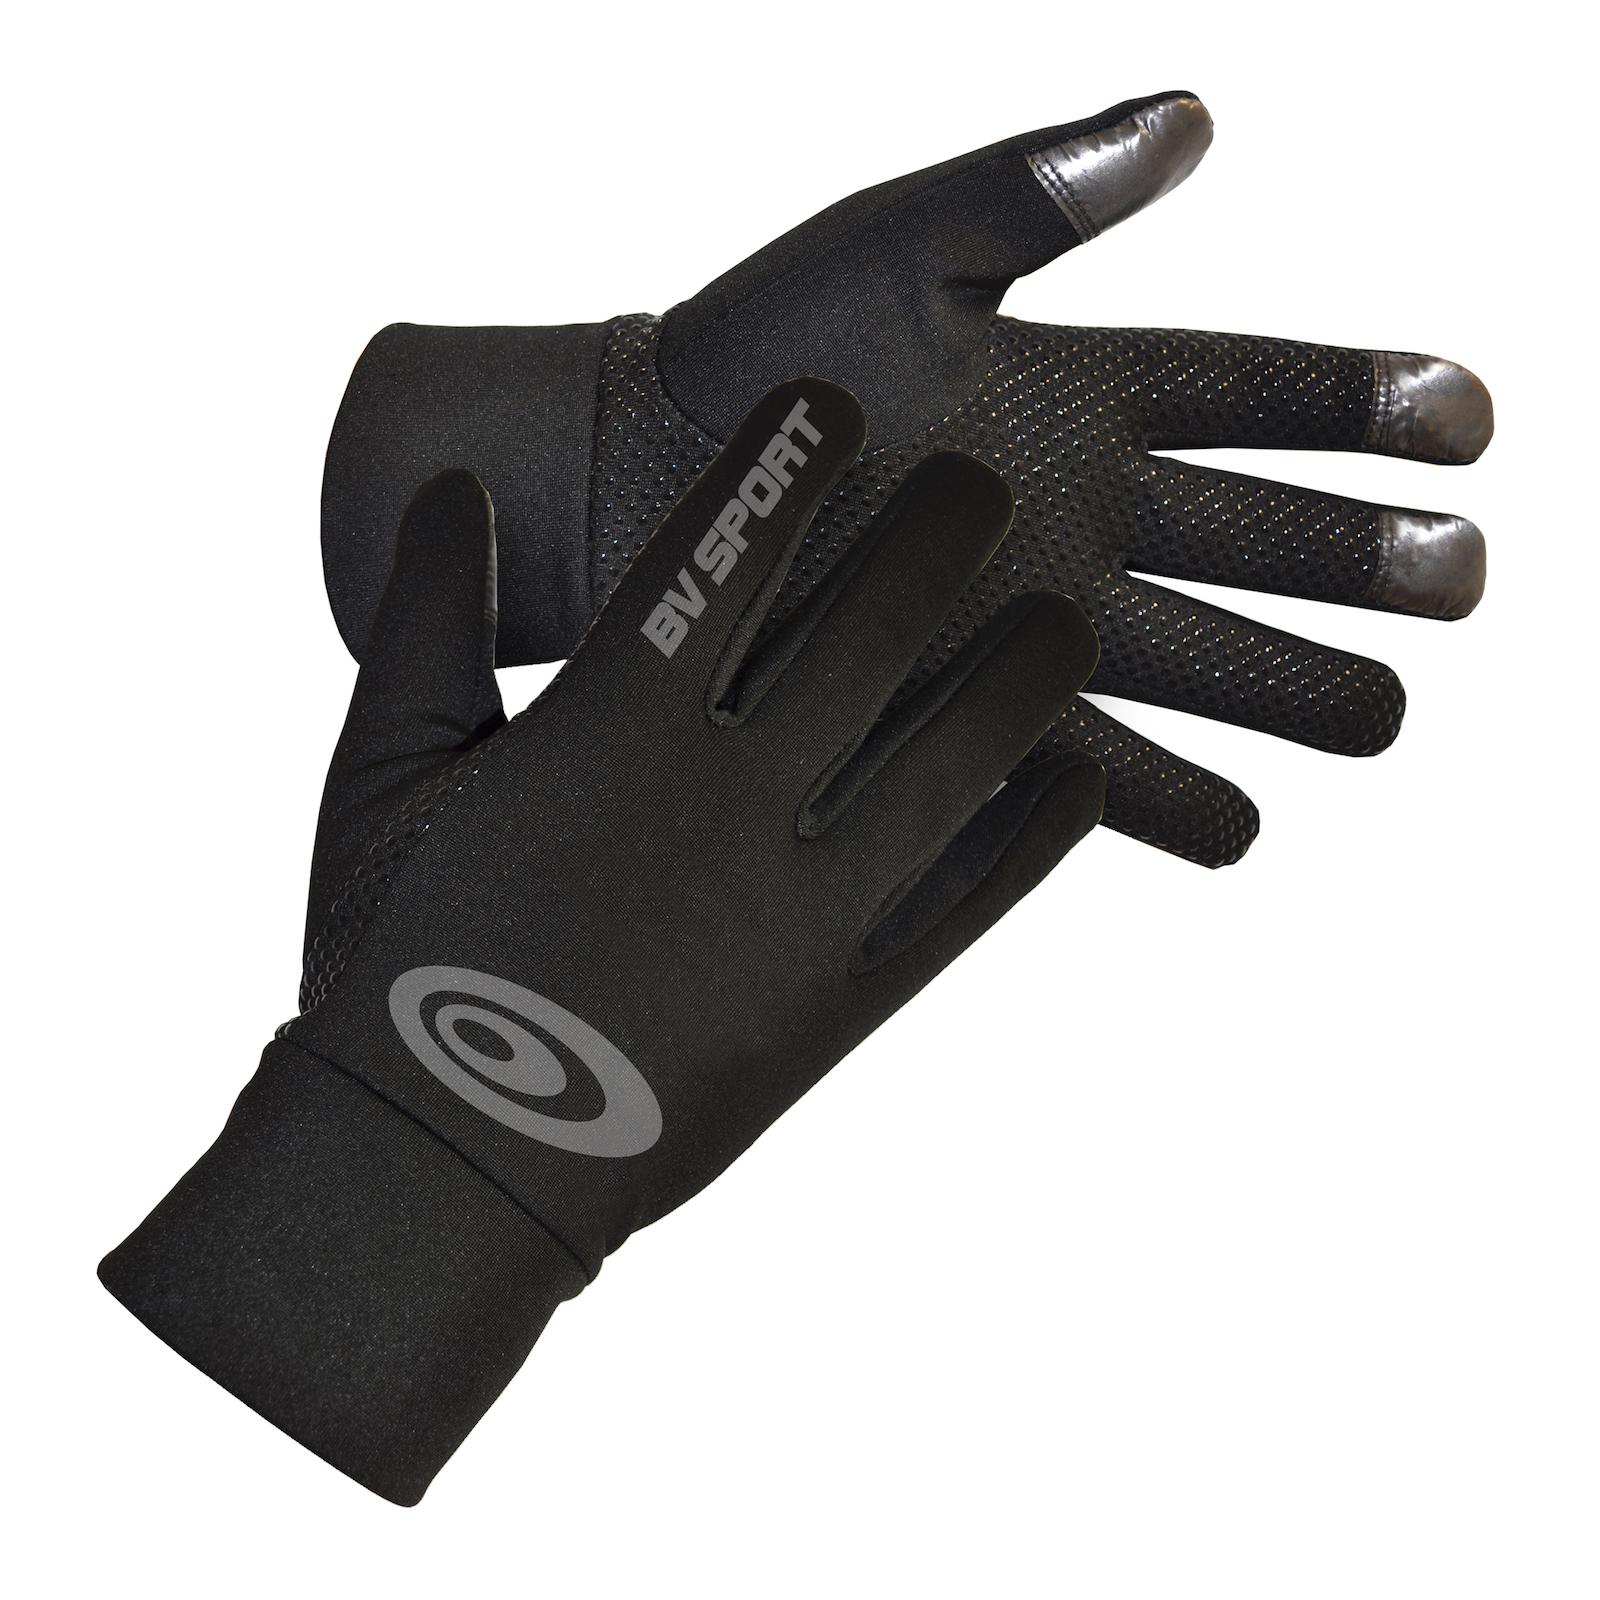 BV Sport Tactiles - Handschuhe